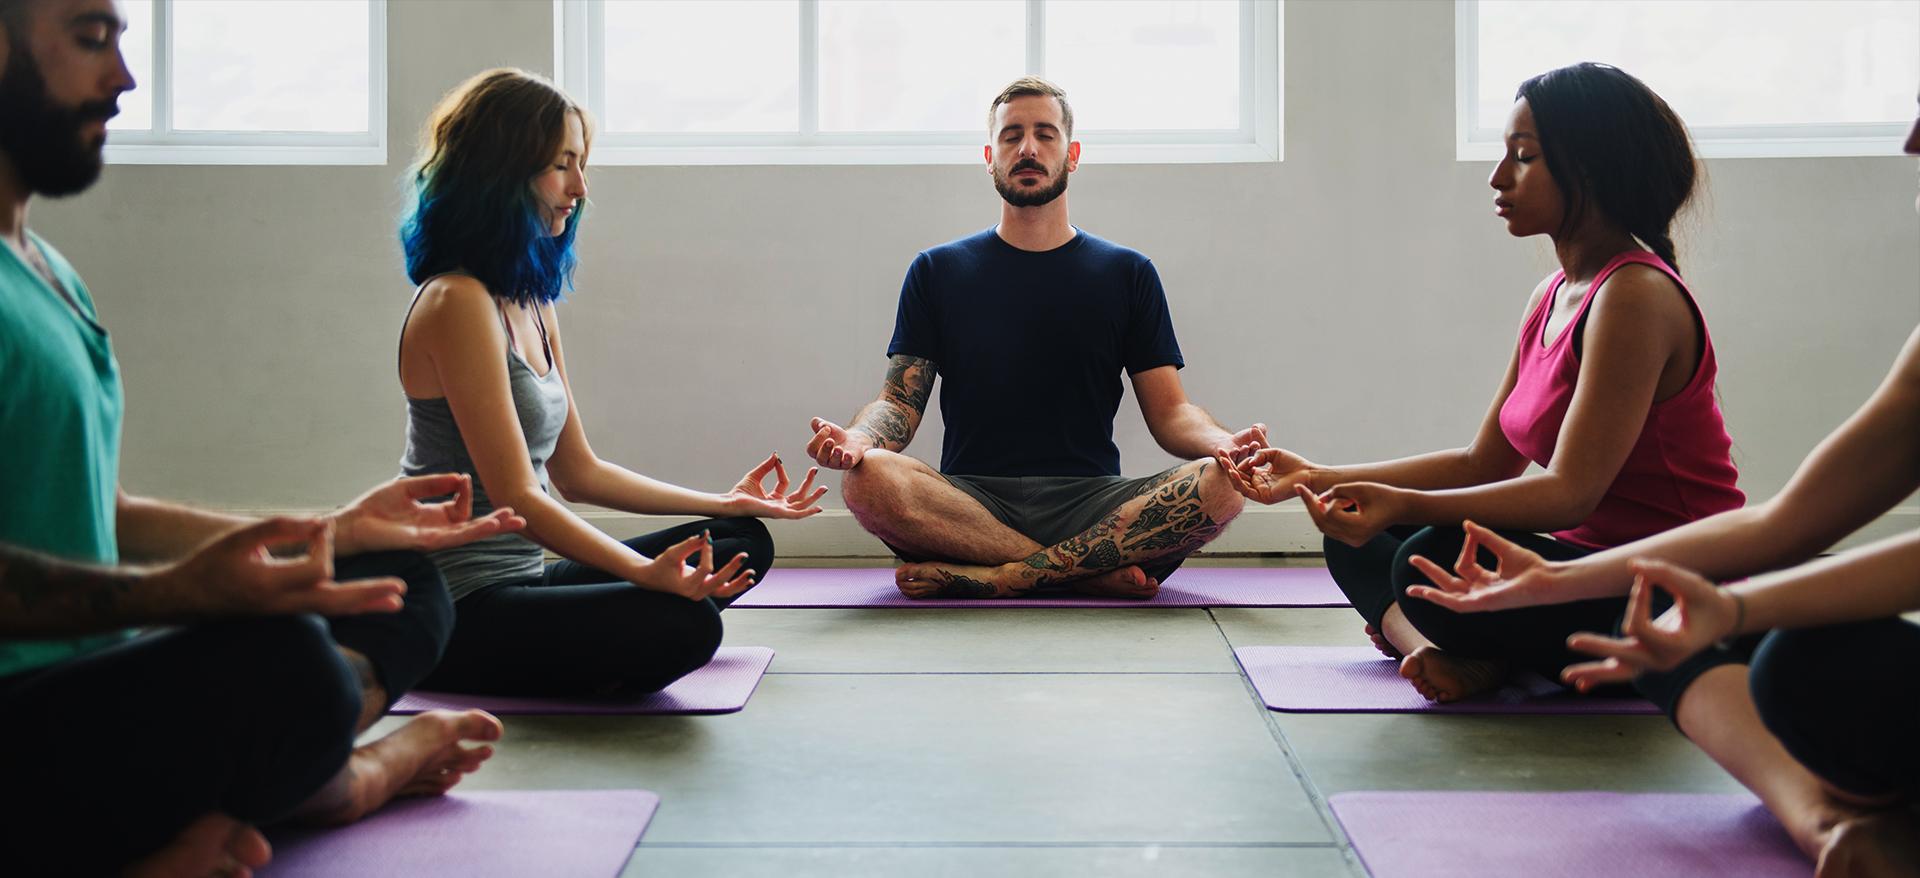 300 Hour Advanced Yoga Teacher Training in Mississauga